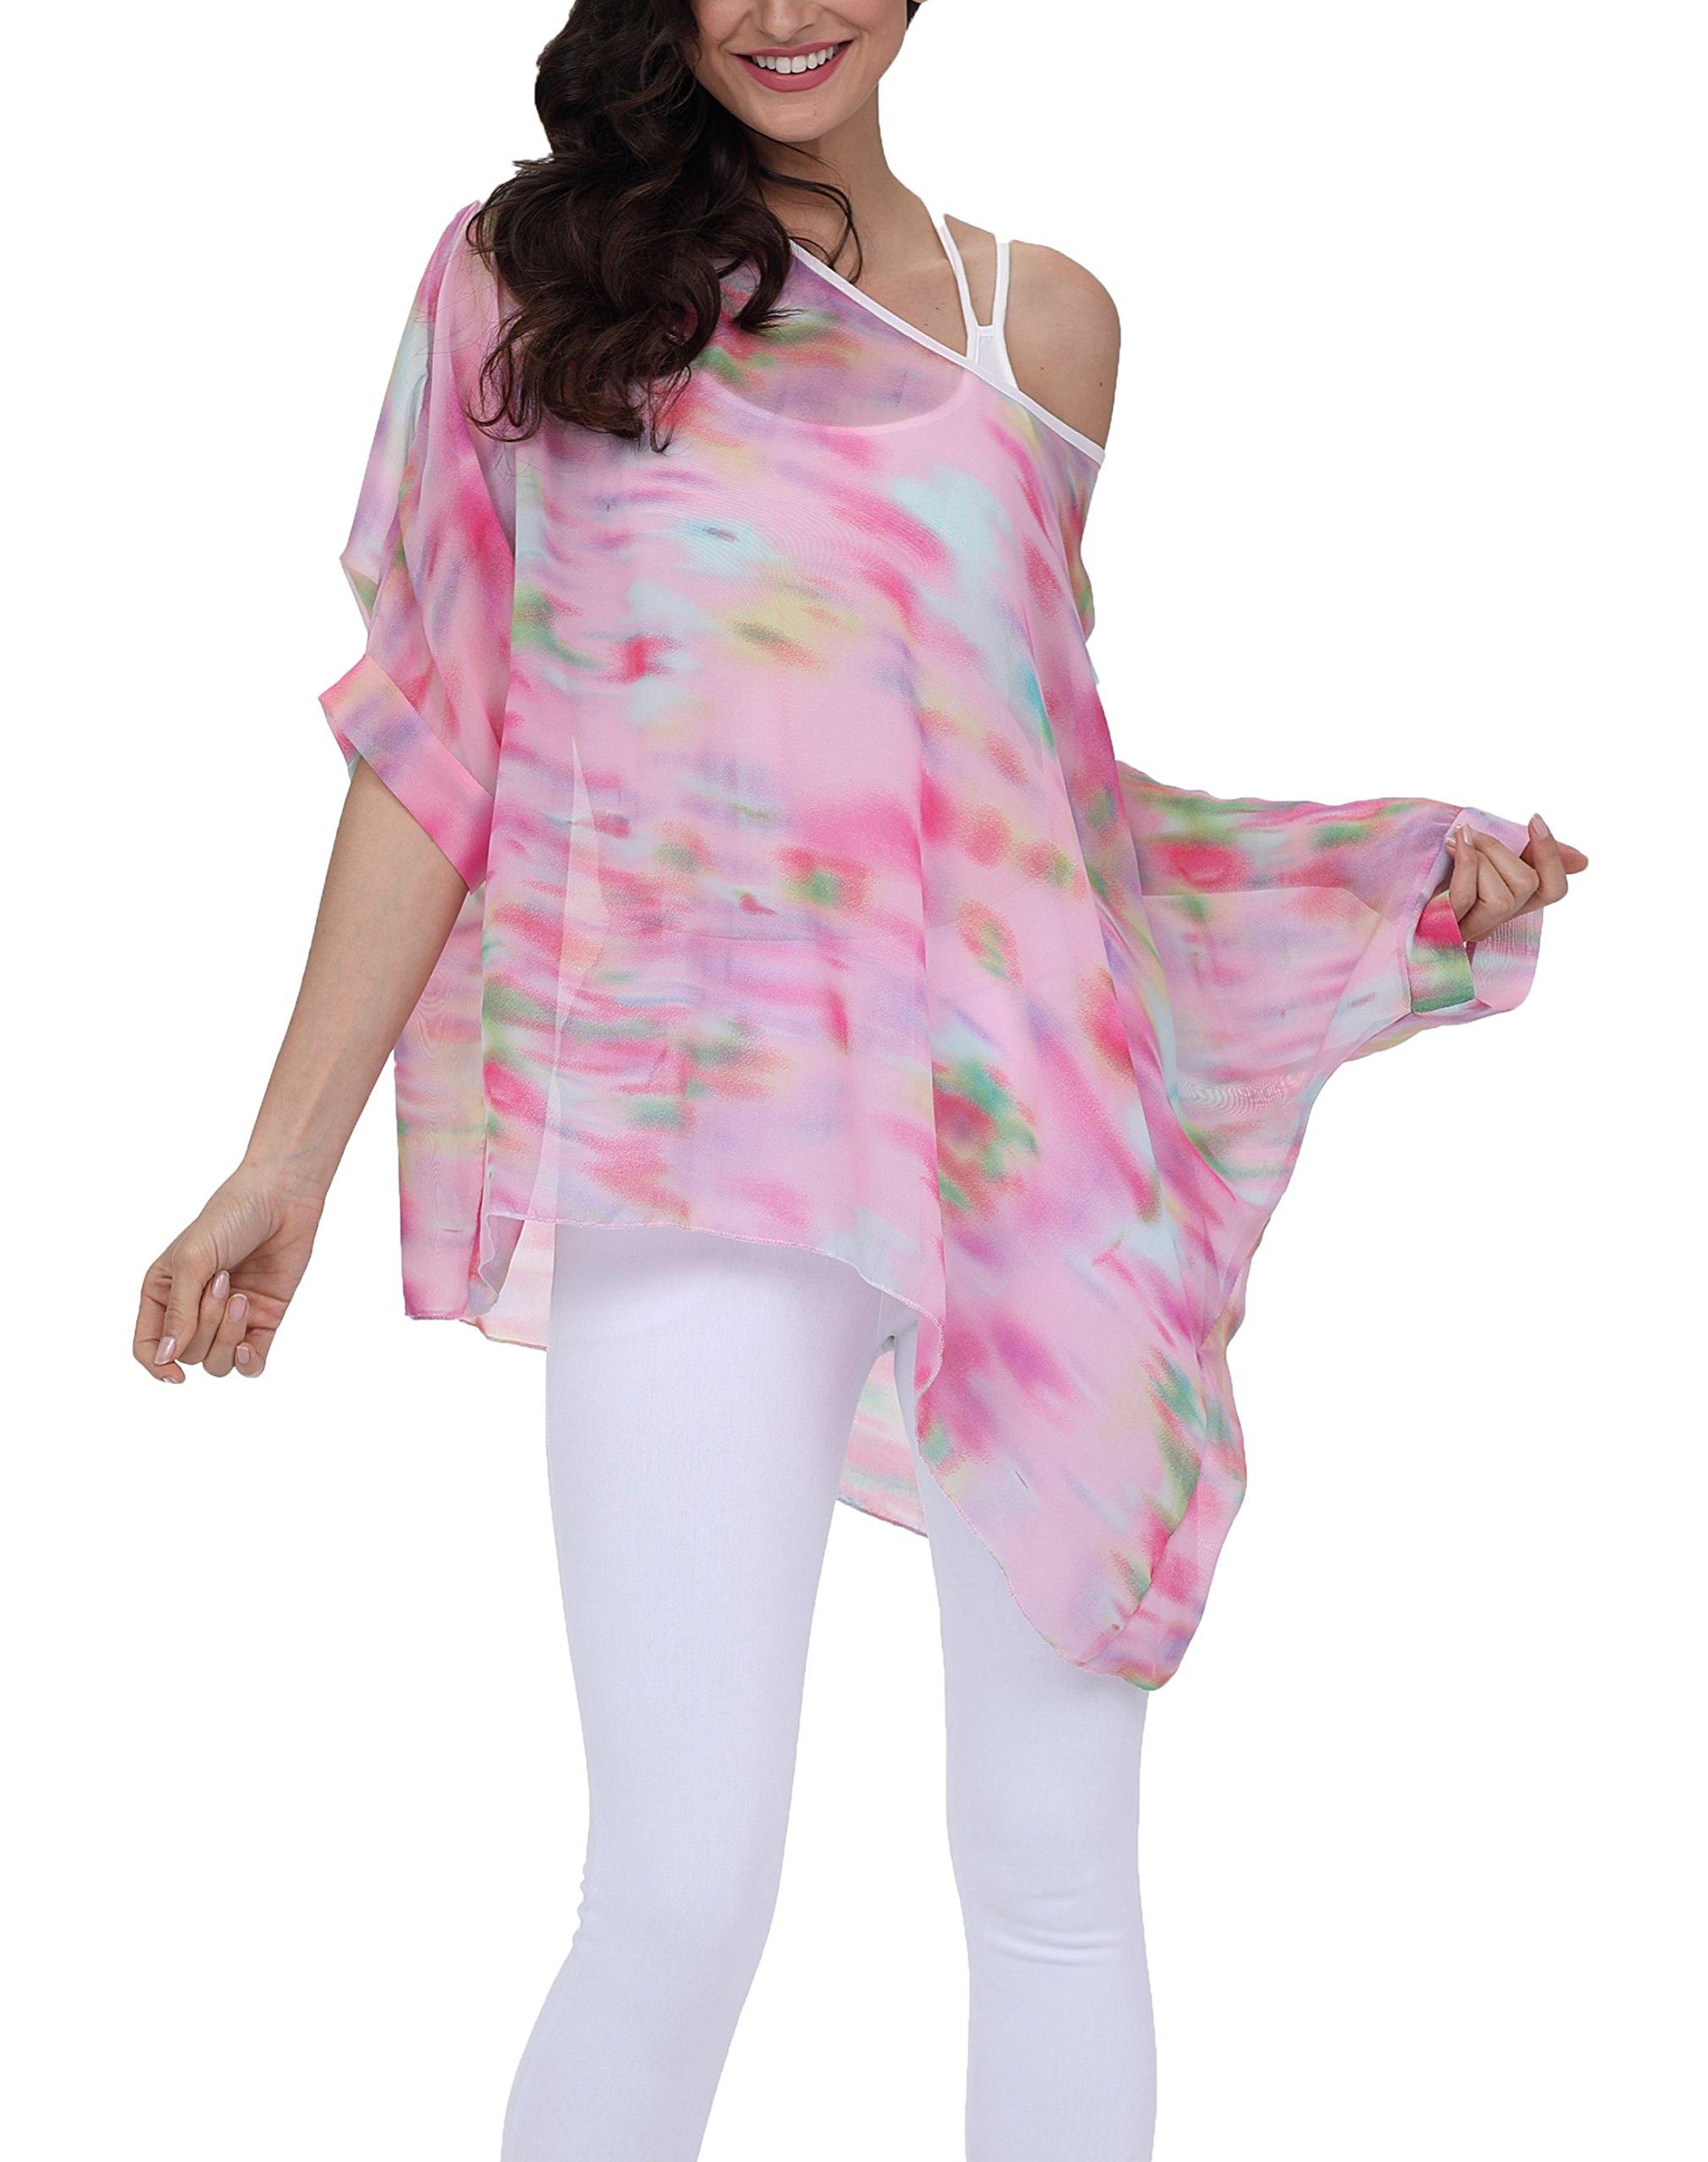 iNewbetter Womens Floral Batwing Sleeve Chiffon Beach Loose Blouse Tunic Tops PB278